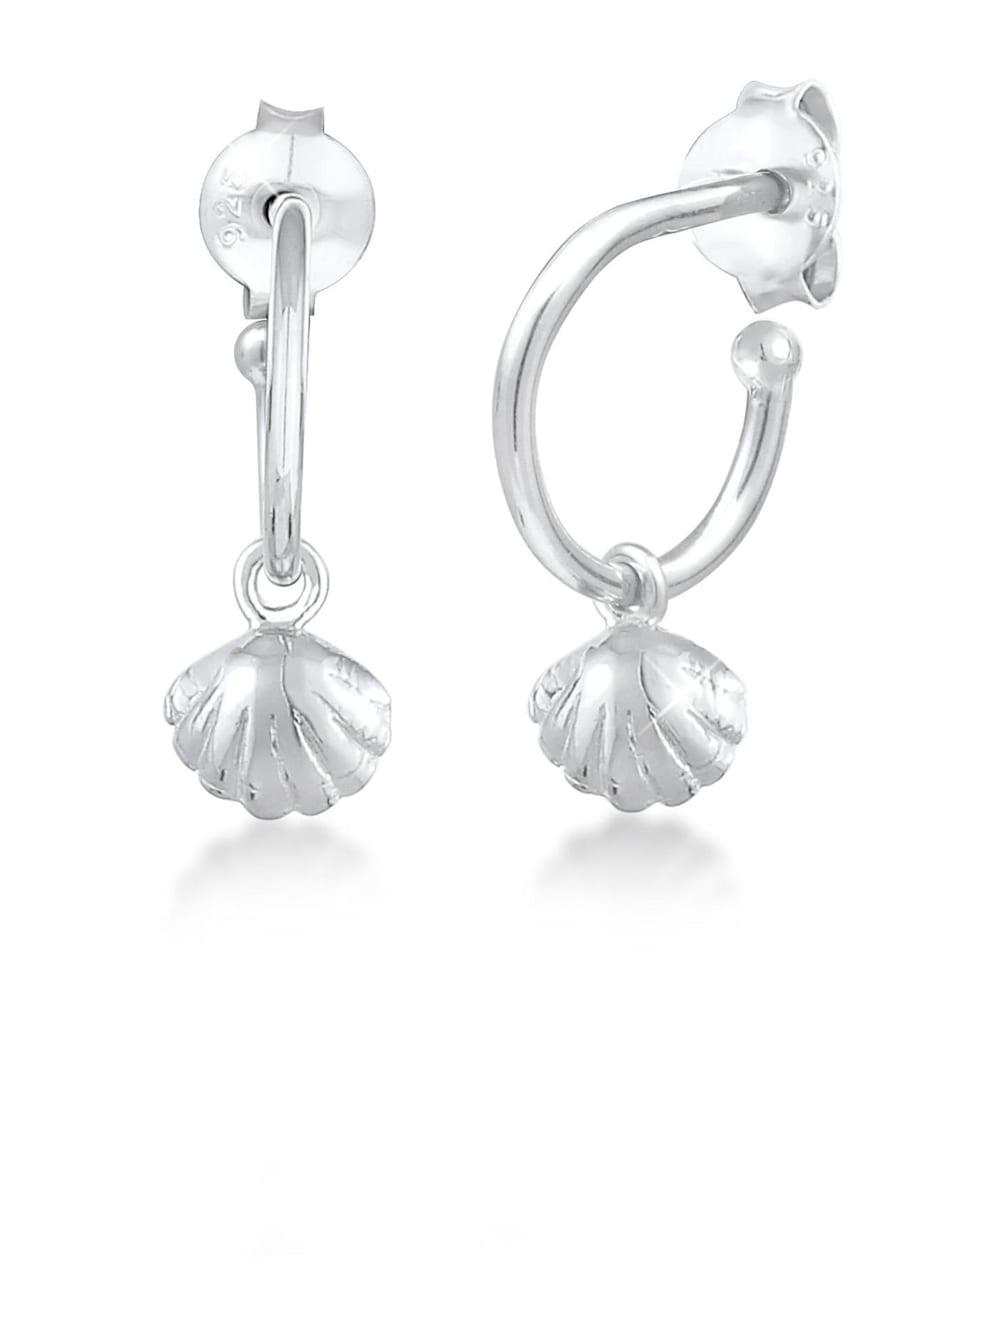 Elli Elli Ohrringe Creolen Herzmuschel Hänger Sommer Trend 925 Silber | Klingel